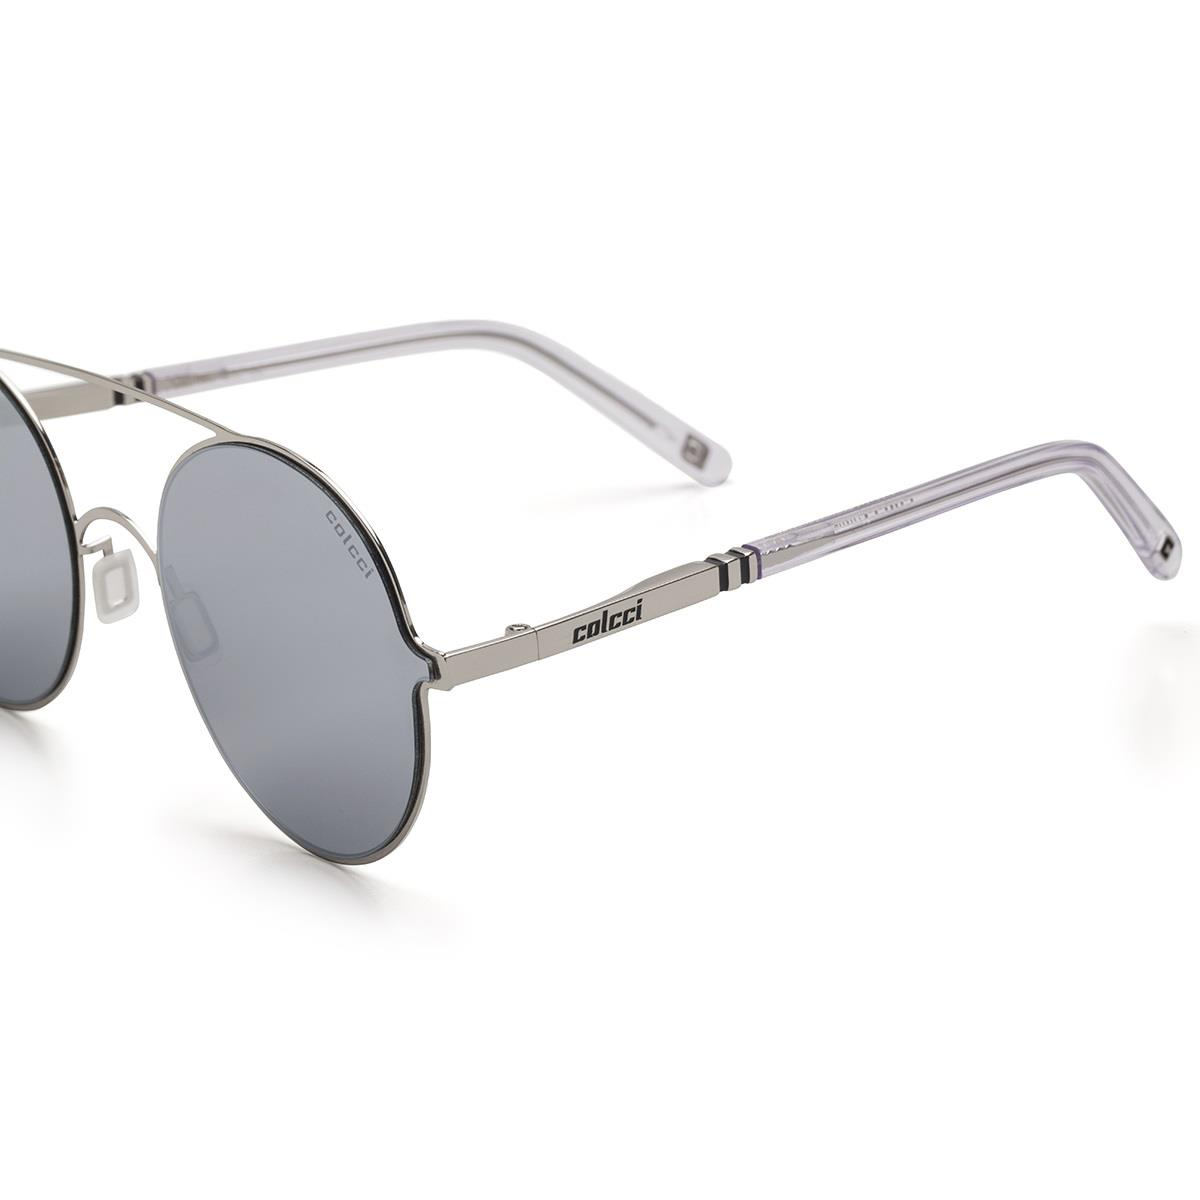 1469311e998d7 Óculos De Sol Colcci C0100 Prata Brilho Translúcido Lente Cinza na Estrela10